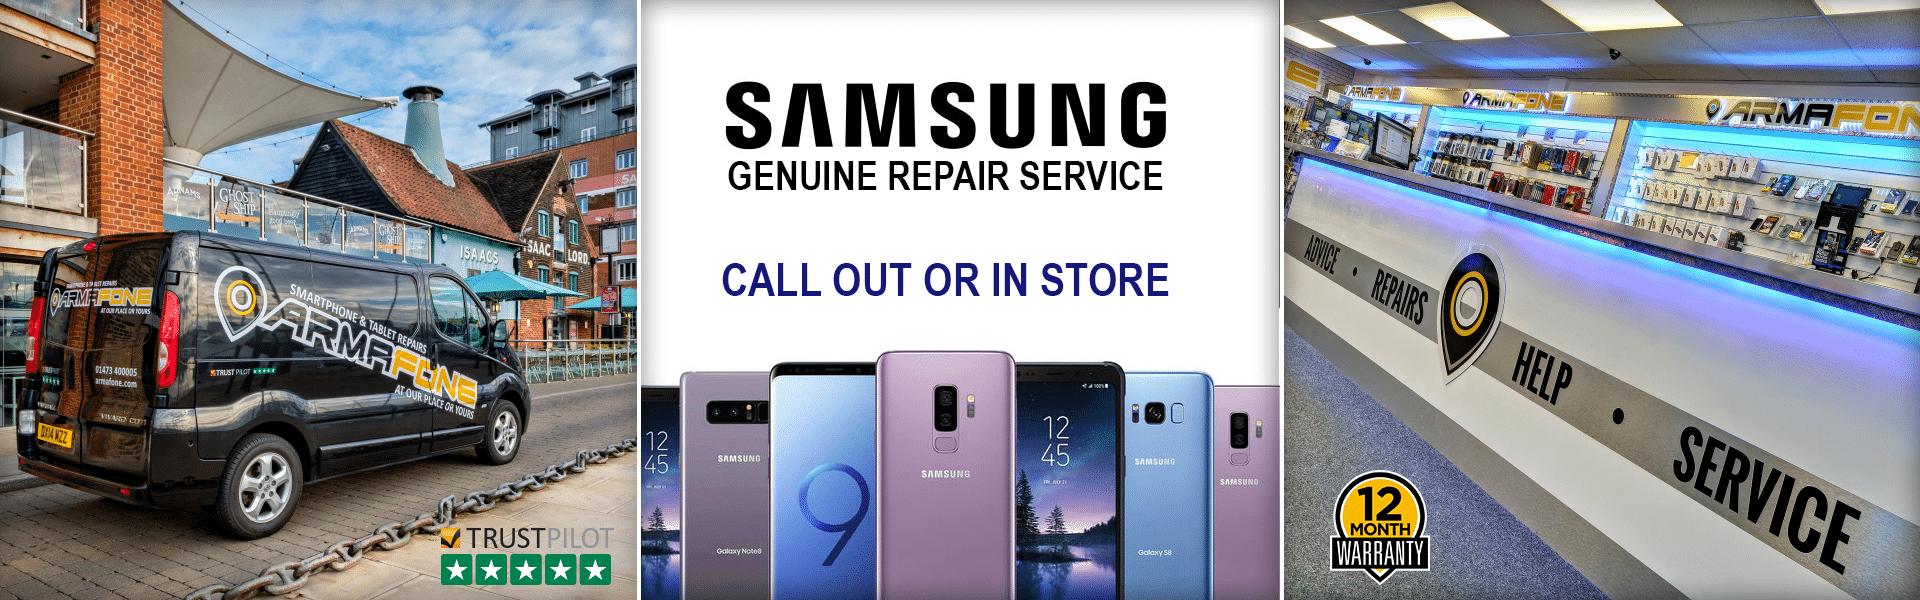 Samsung repair services header